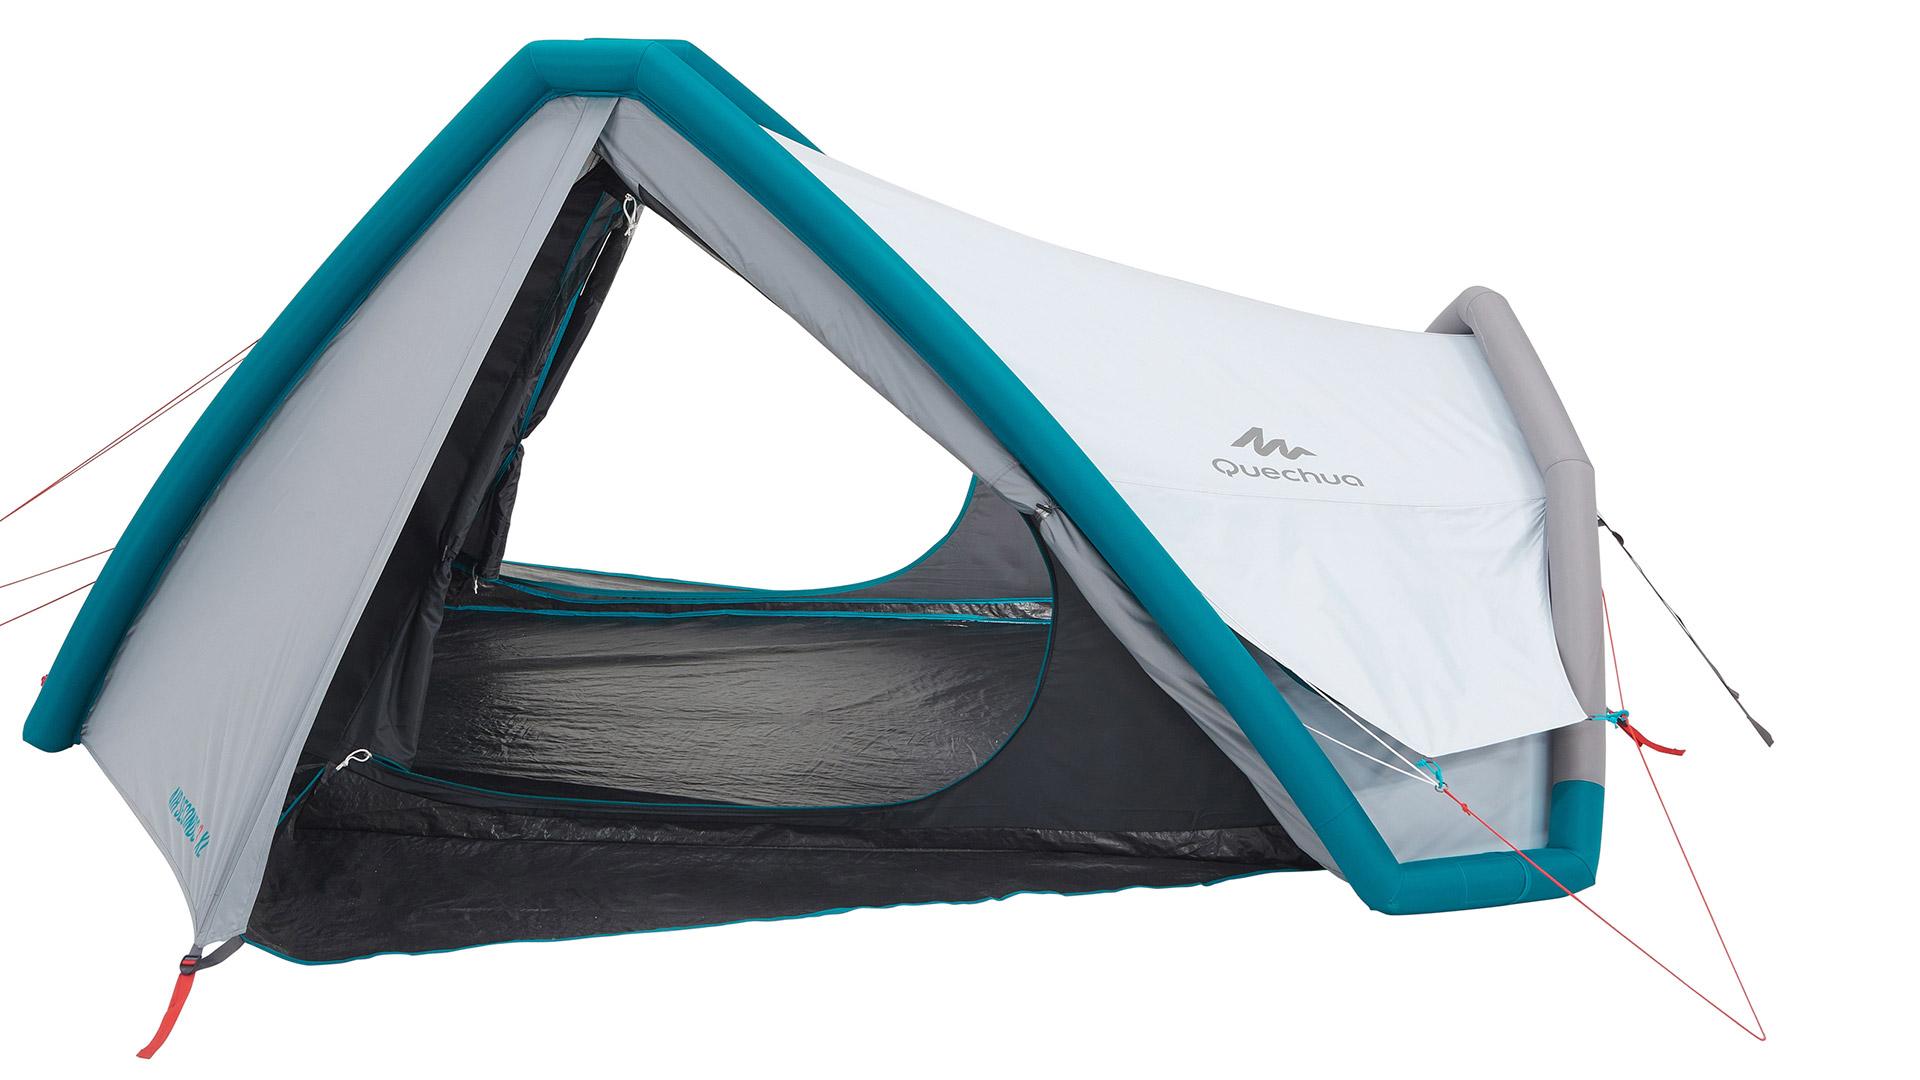 Quechua 2 Seconds 3 XL Fresh Black 3 Person Camping Tent Outdoor Waterproof 2019